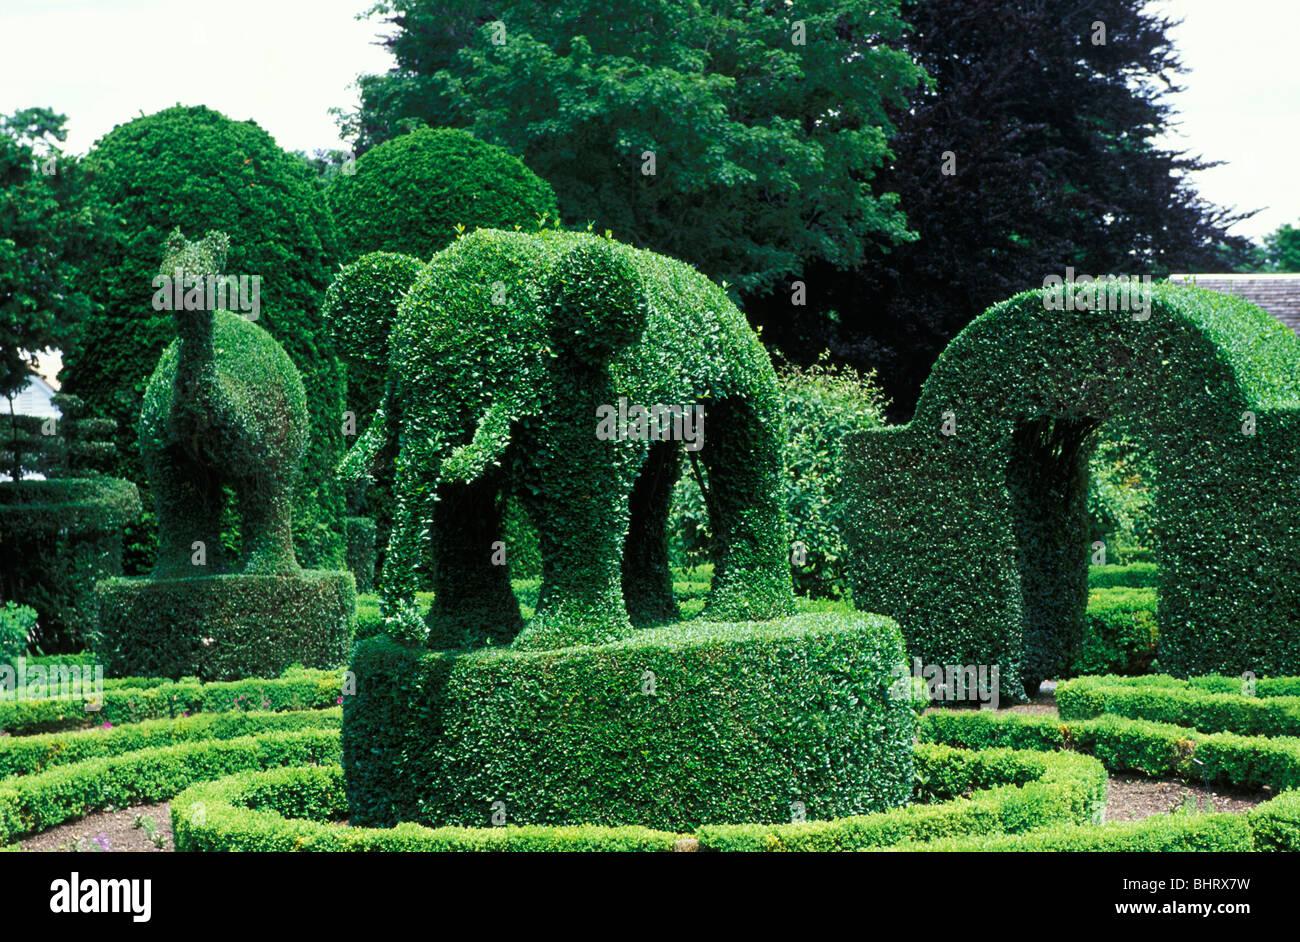 Green Animals Topiary Gardens Newport Rhode Island Stock Photo Royalty Free Image 28185021 Alamy